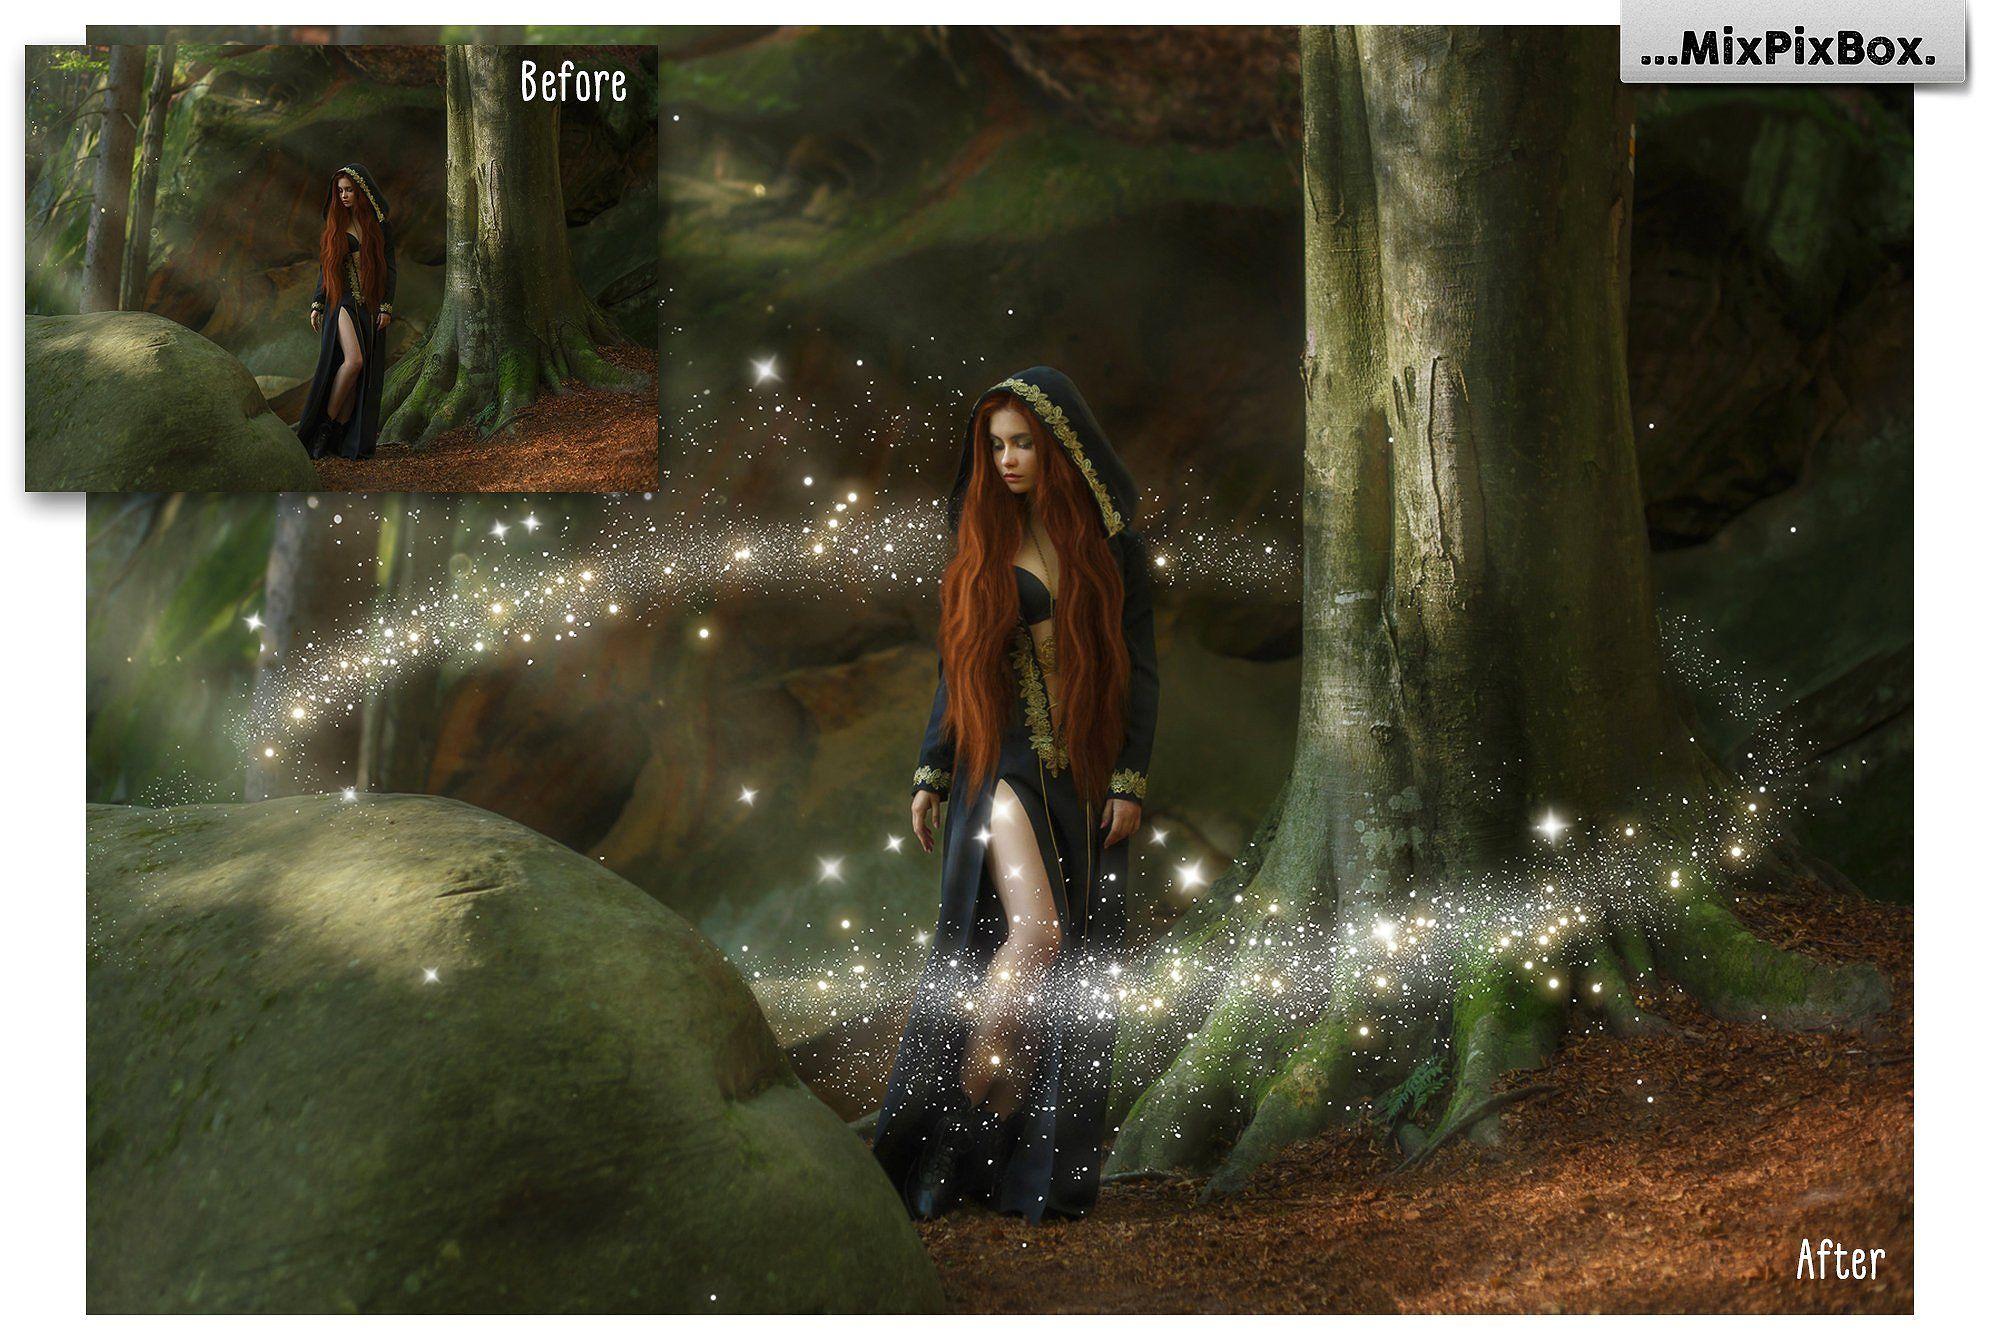 Transparent background photoshop express